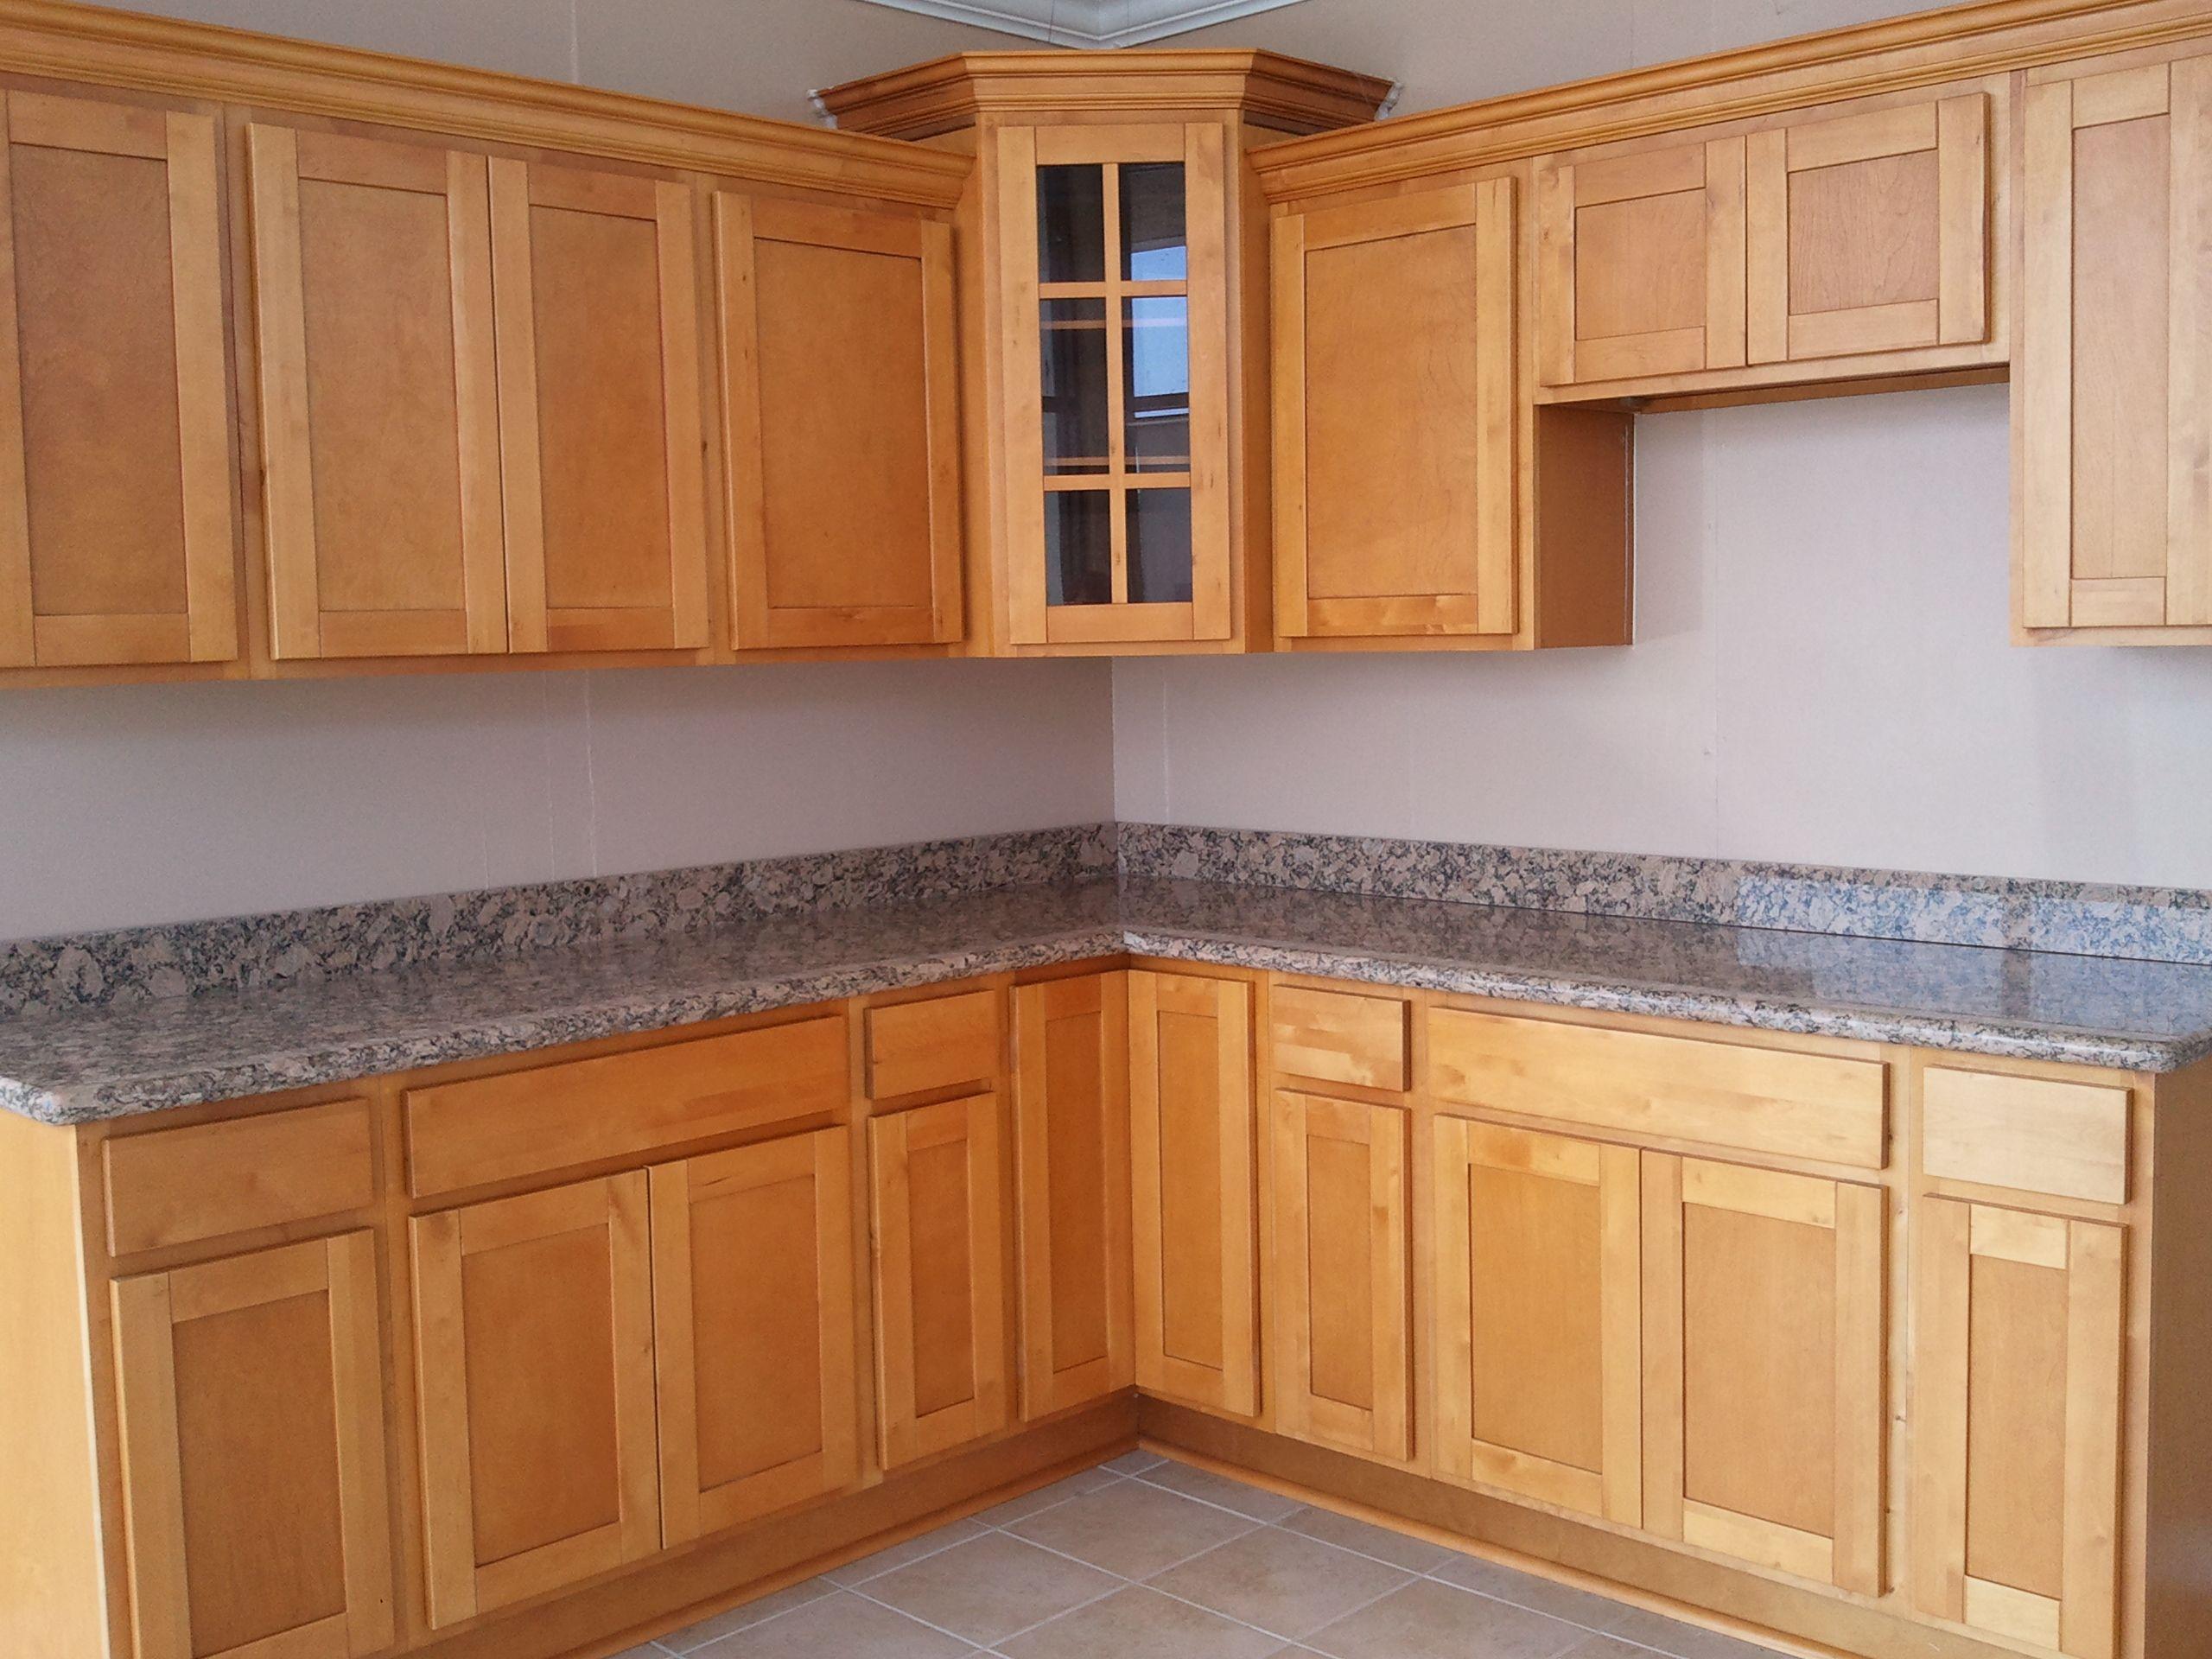 Great Style Birch No Stain Free Kitchen Cabinets Unfinished Kitchen Cabinets Country Kitchen Cabinets